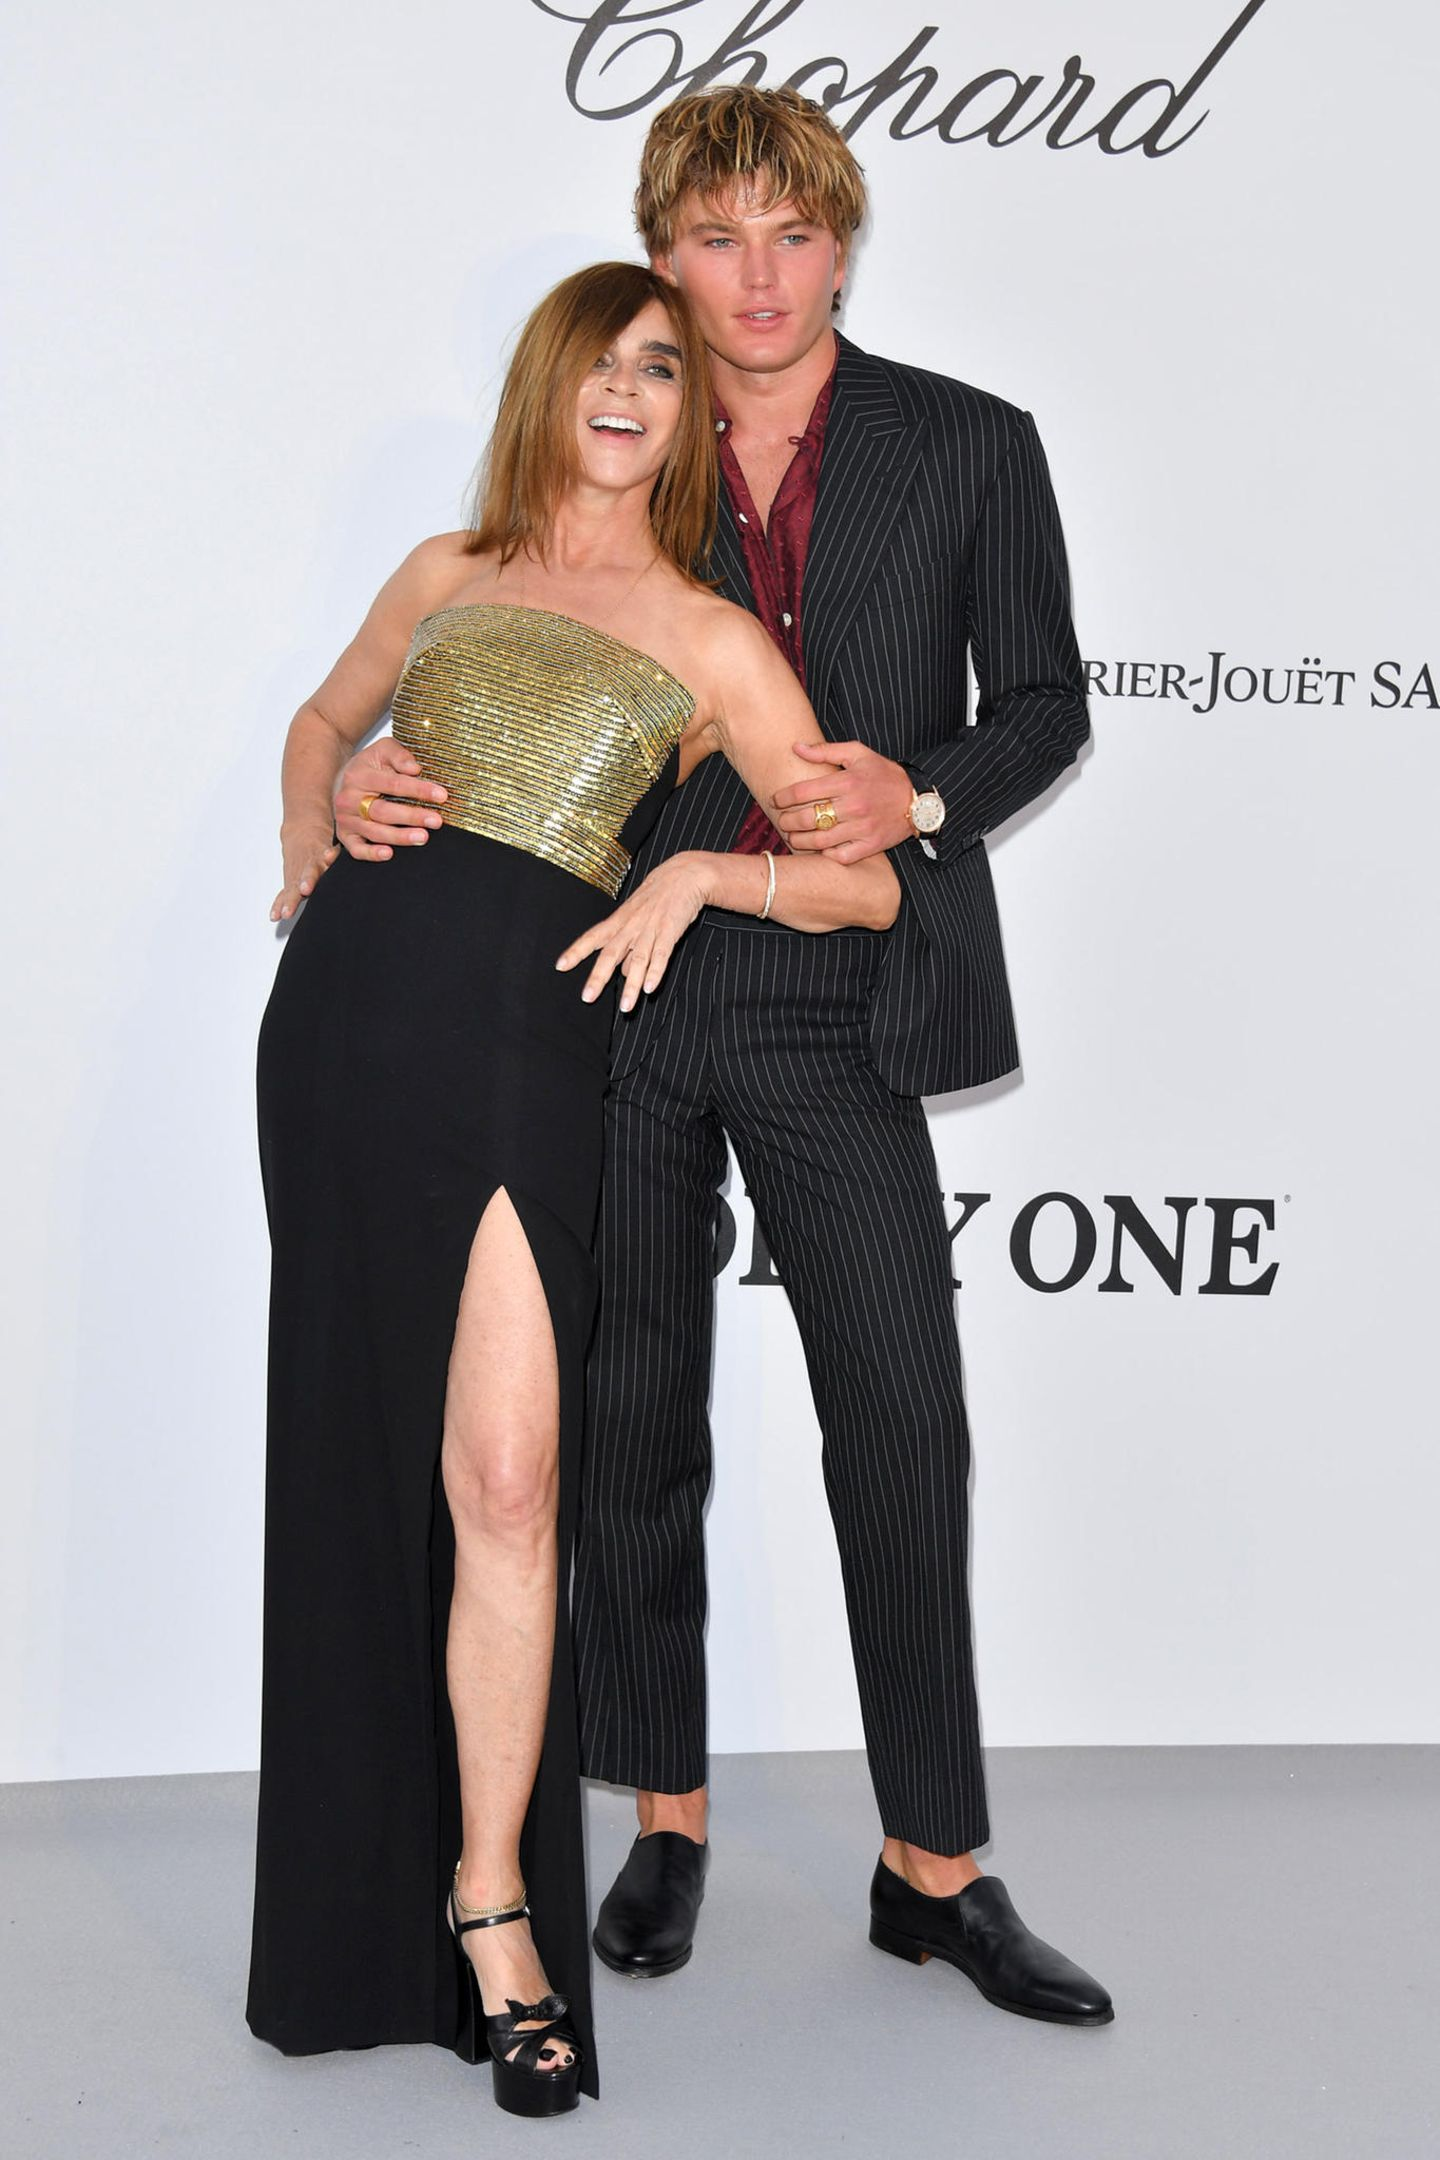 Carine Roitfeld posiert im stylischen Bustier-Look mit Male Model Jordan Barrett.